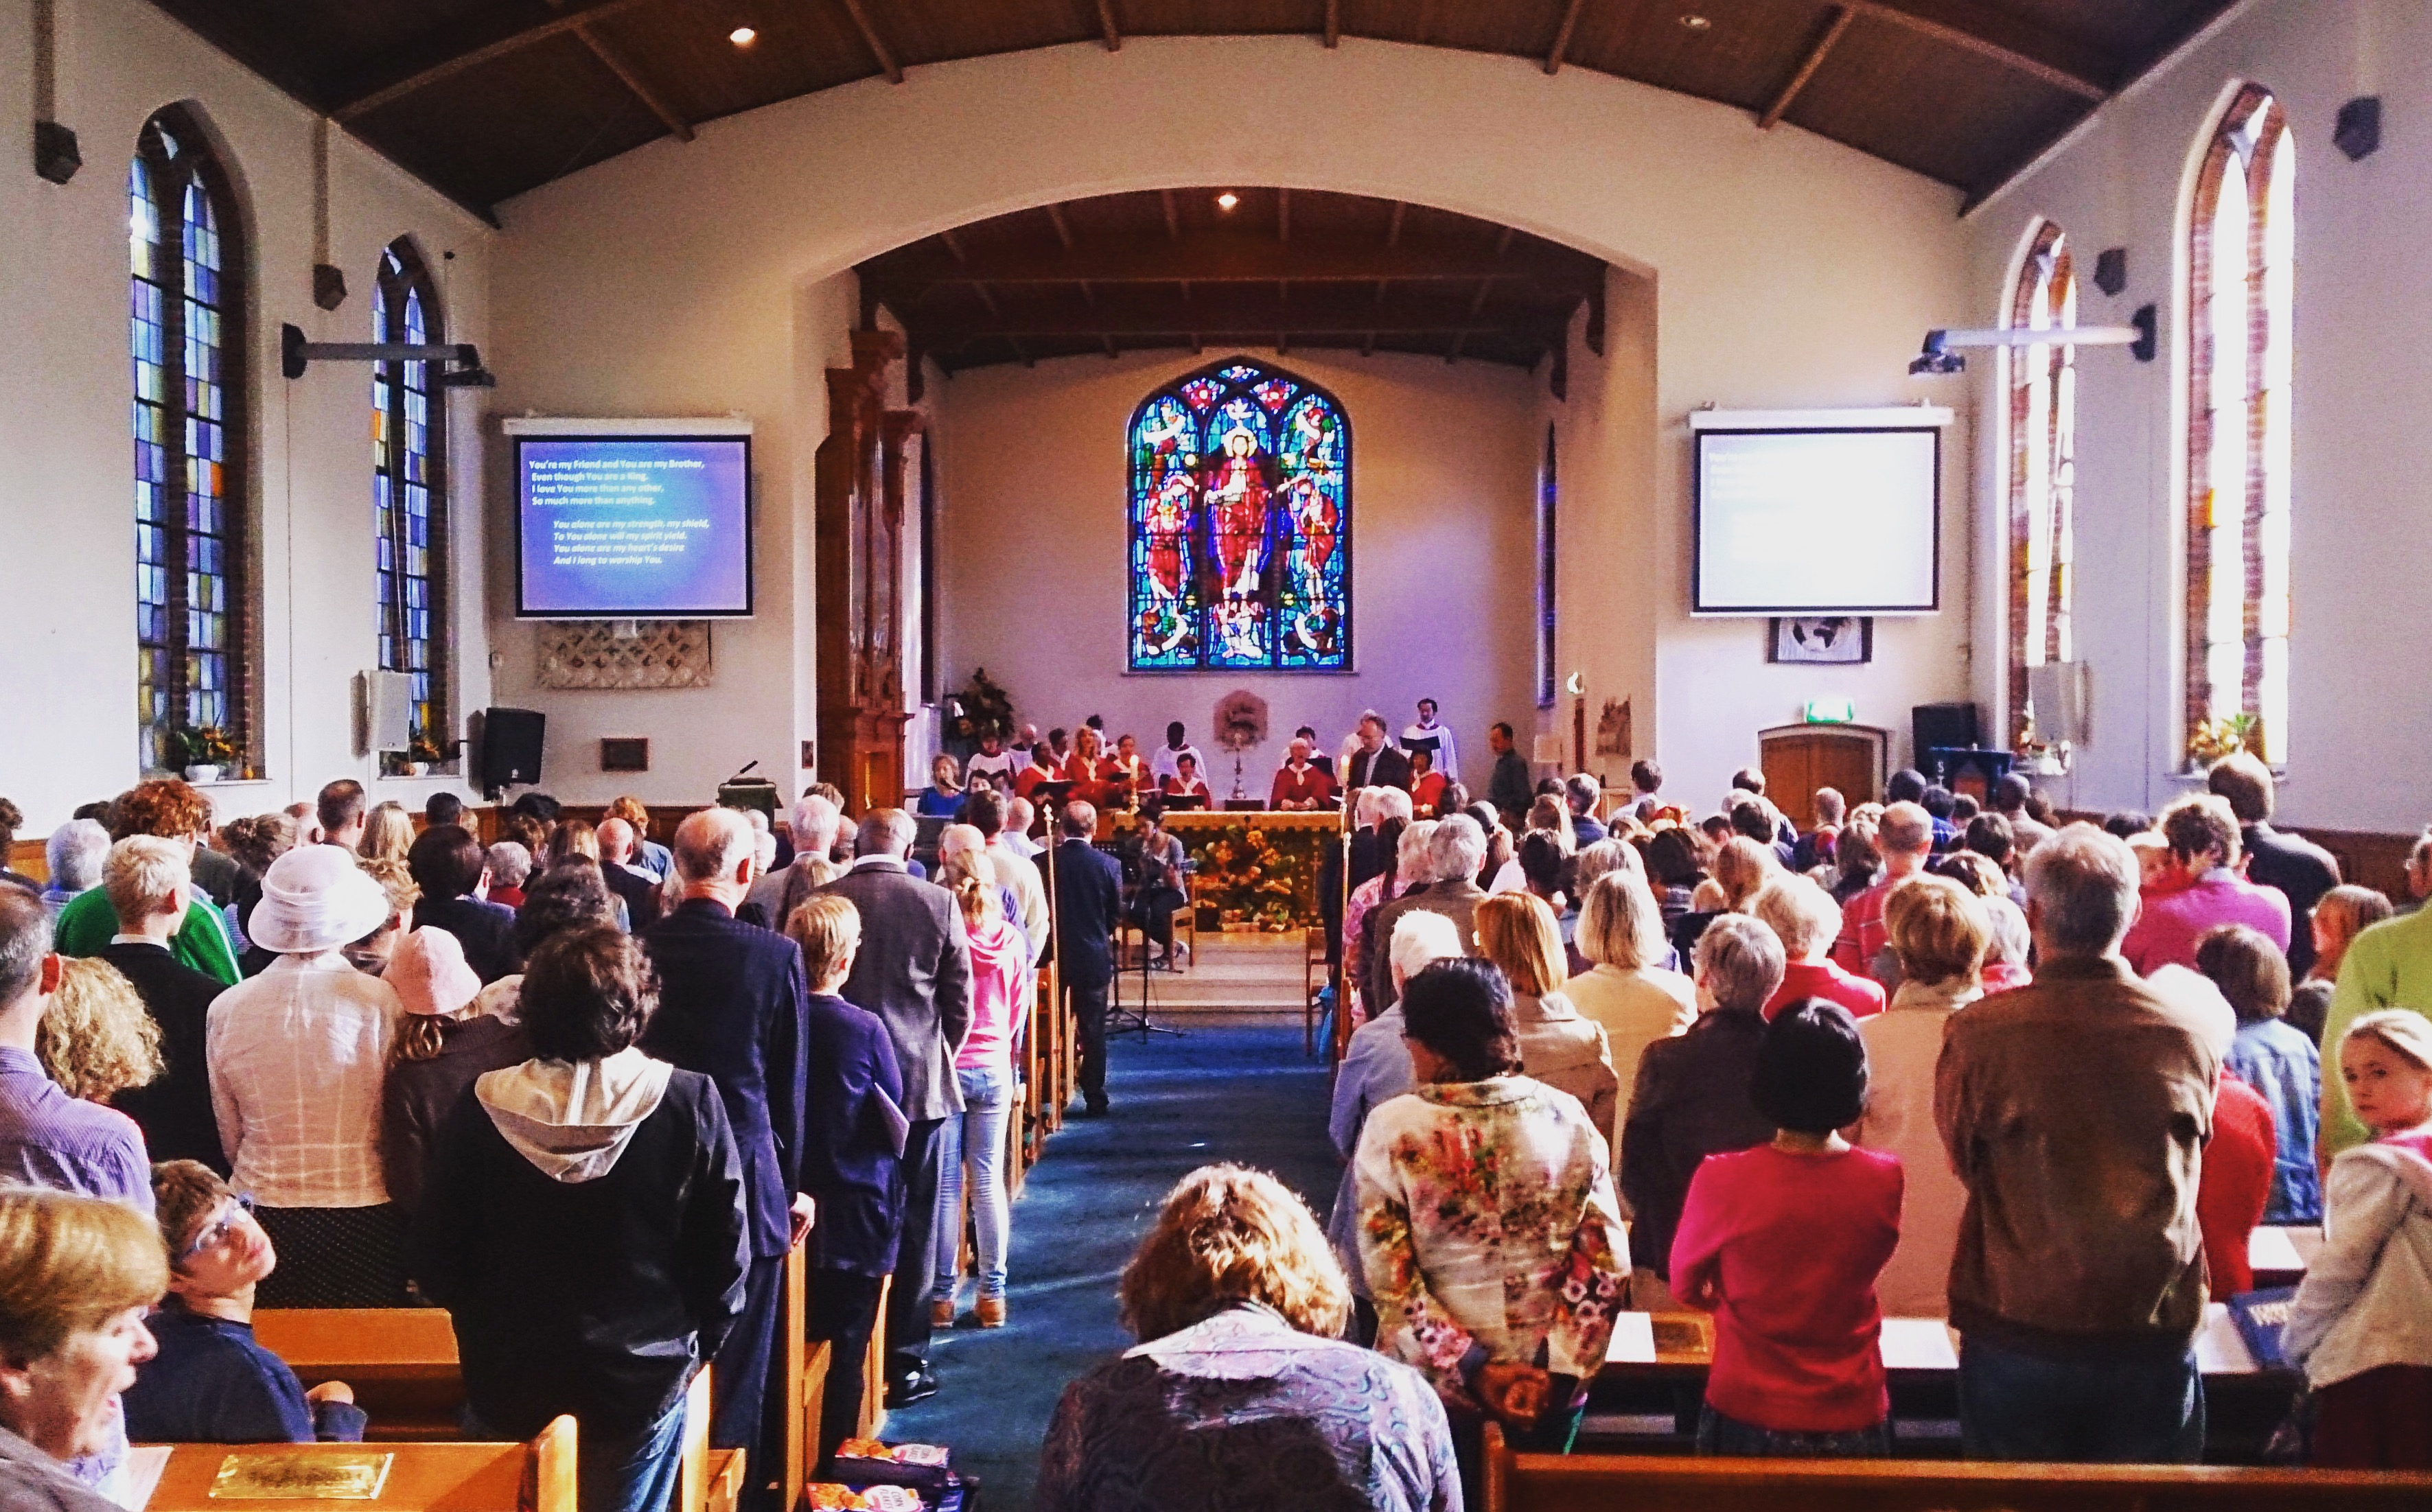 Church service 10